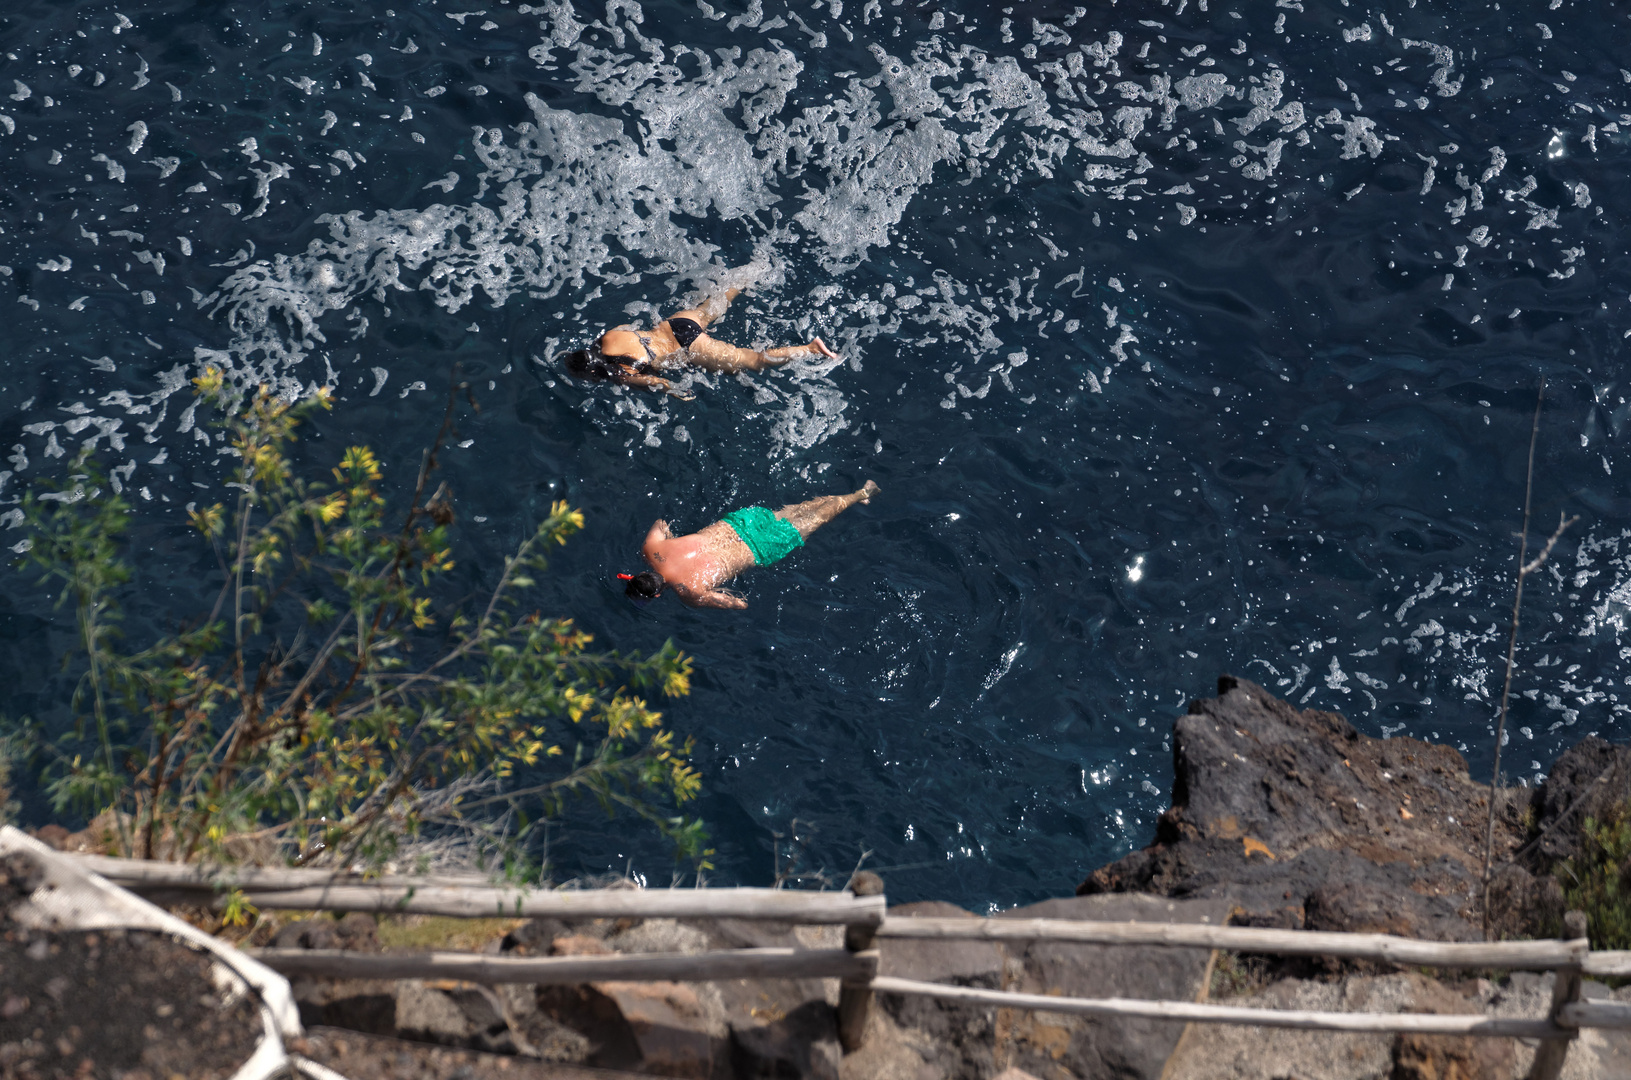 Auf Schnorcheltour, Puerto Puntagorda, La Palma, August 2013